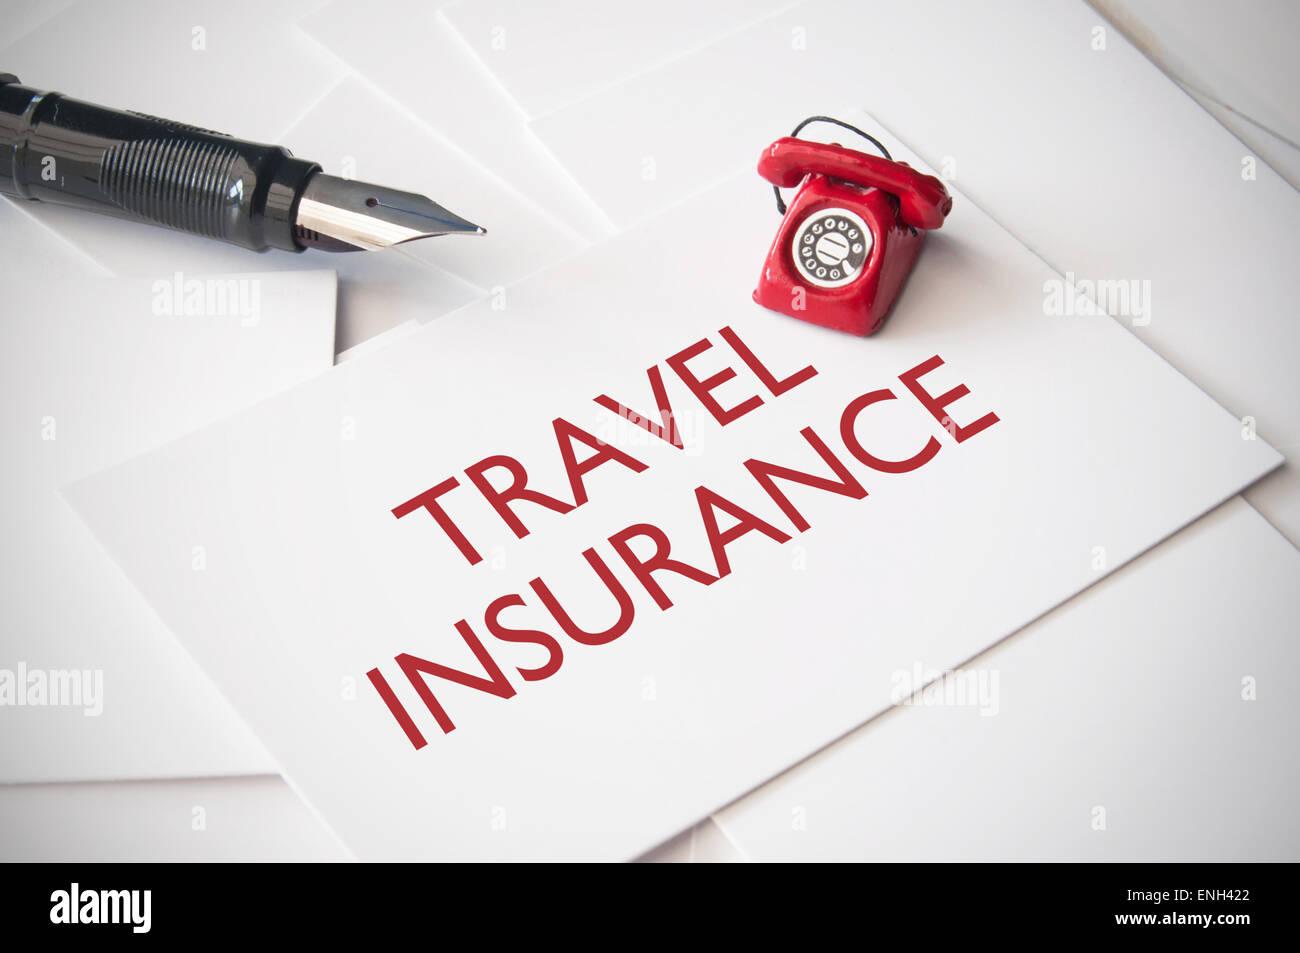 Travel insurance - Stock Image